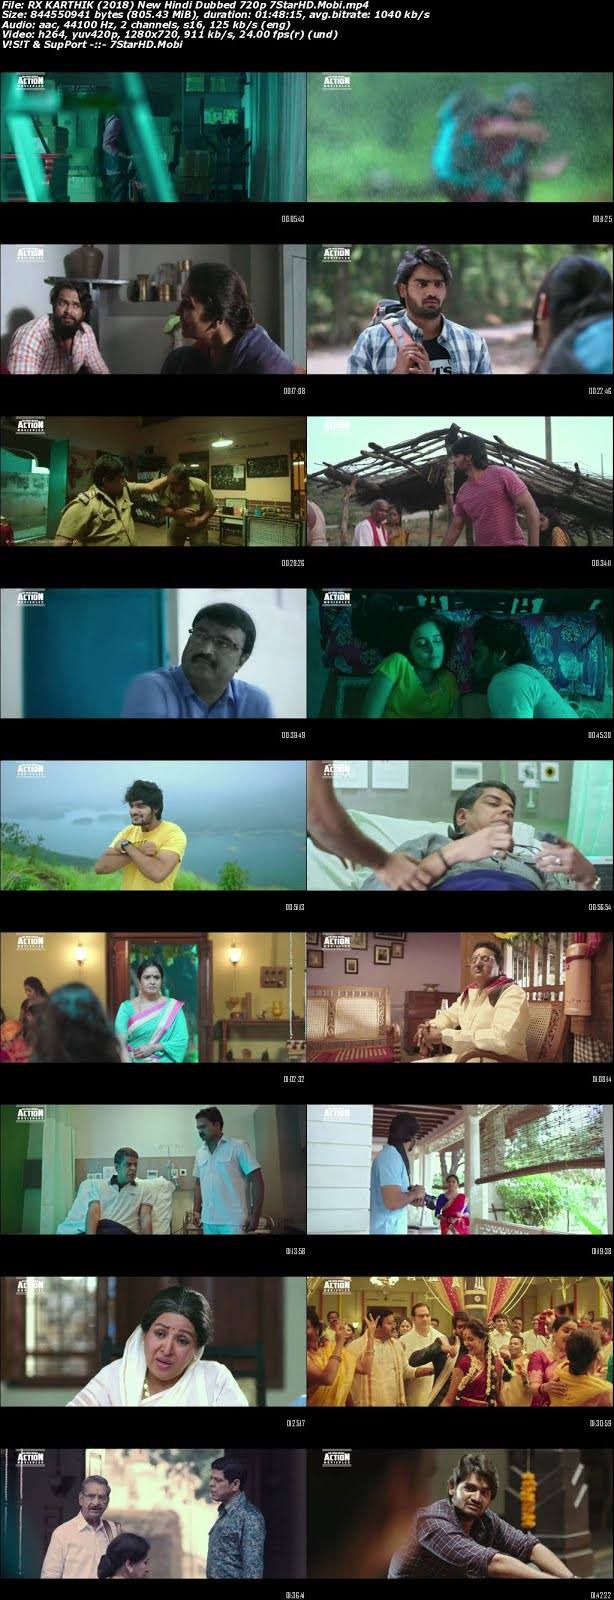 Rx Karthik (Prematho Mee Karthik) 2018 Hindi Dubbed 720p HDRip x264